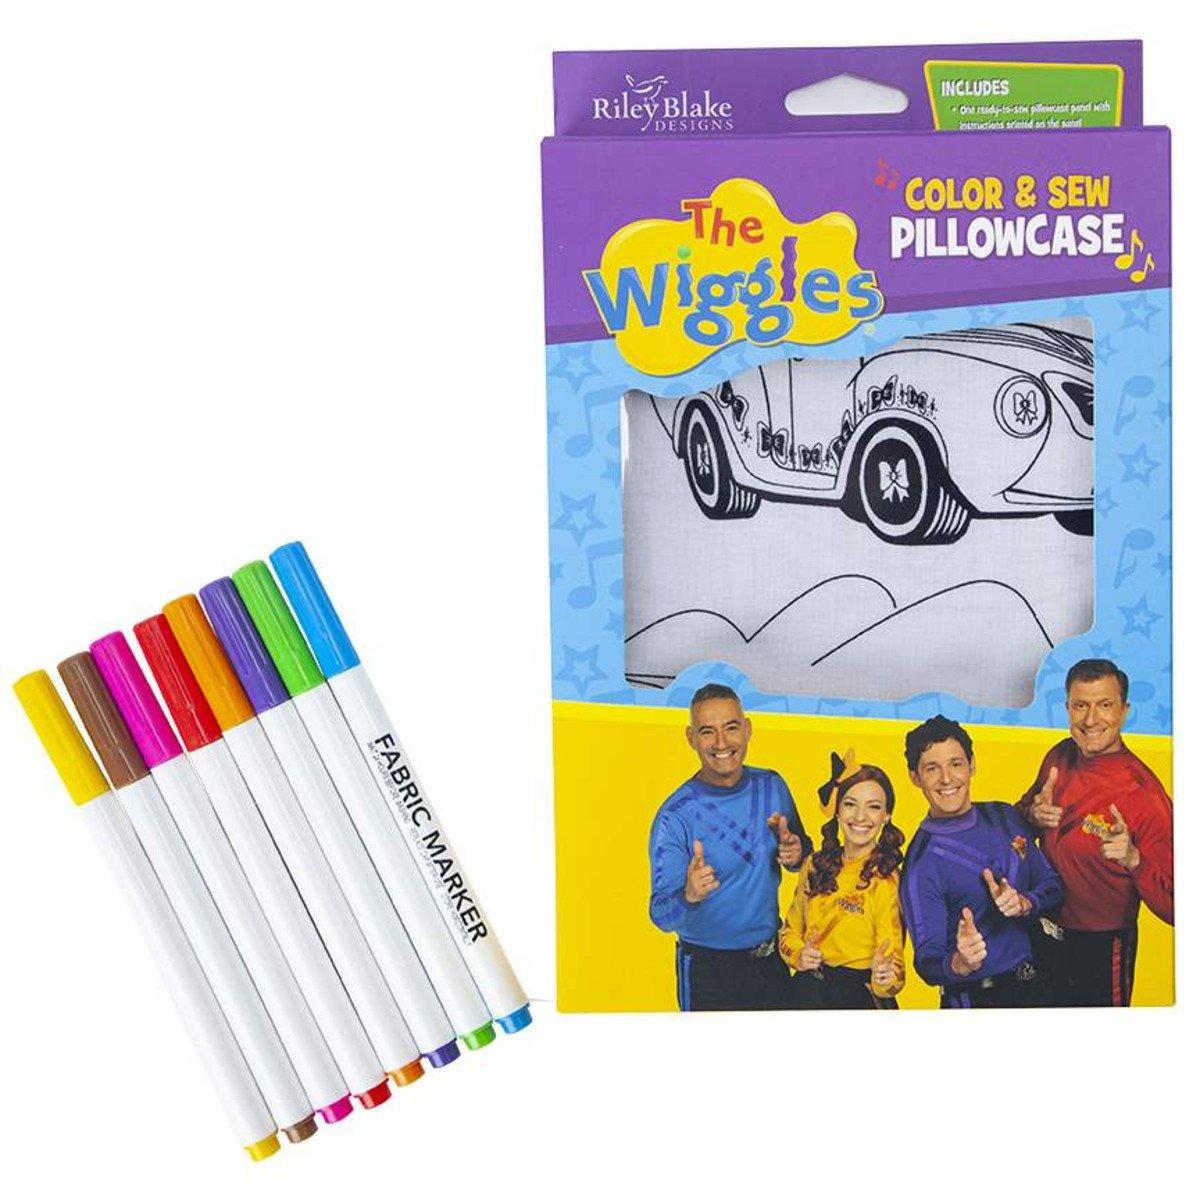 KT0105 - Riley Blake Pillowcase Kit - The Wiggles